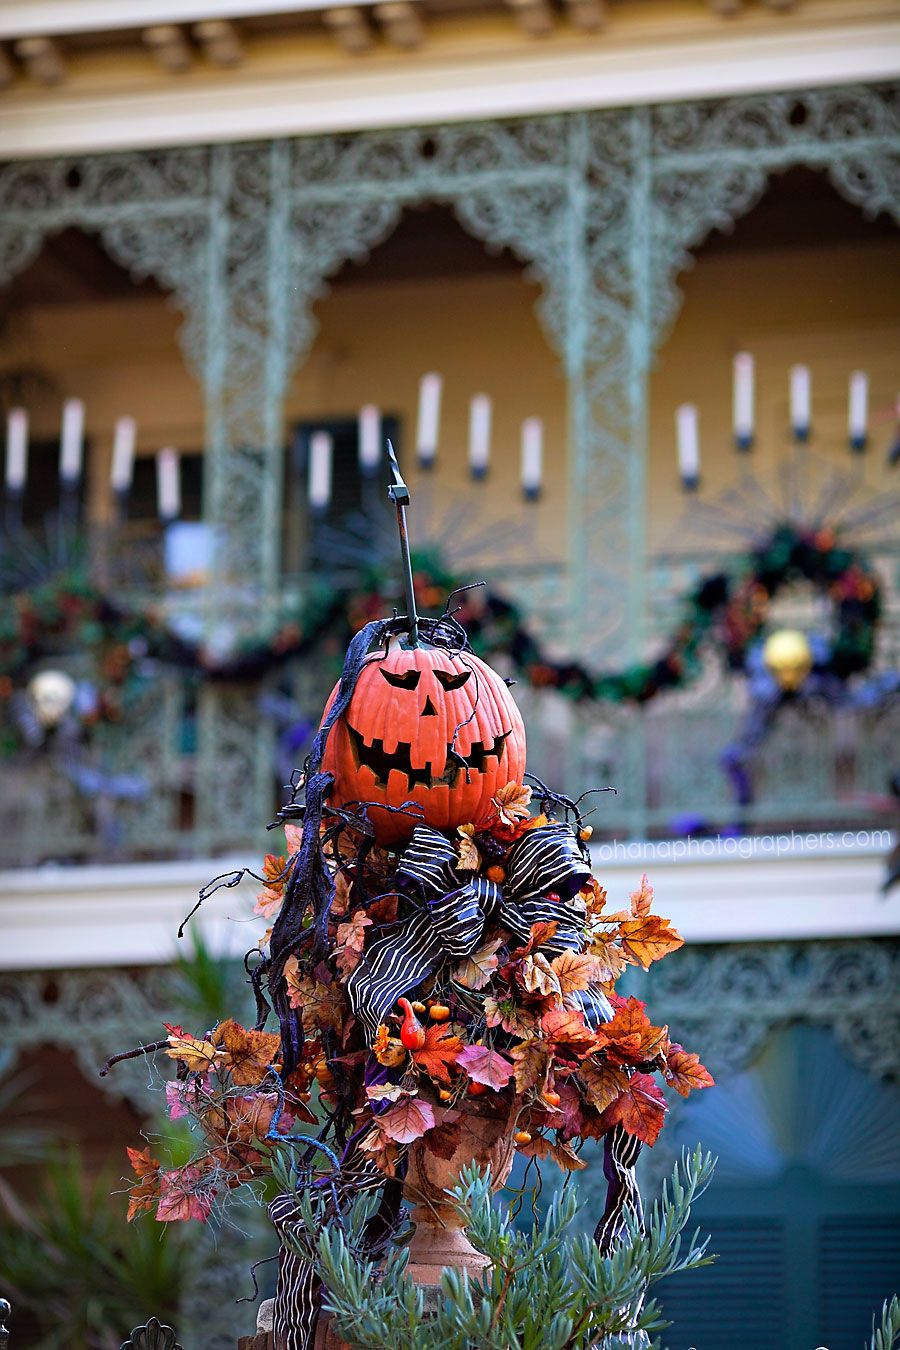 Disneyland // Haunted Mansion Holiday // Halloween at